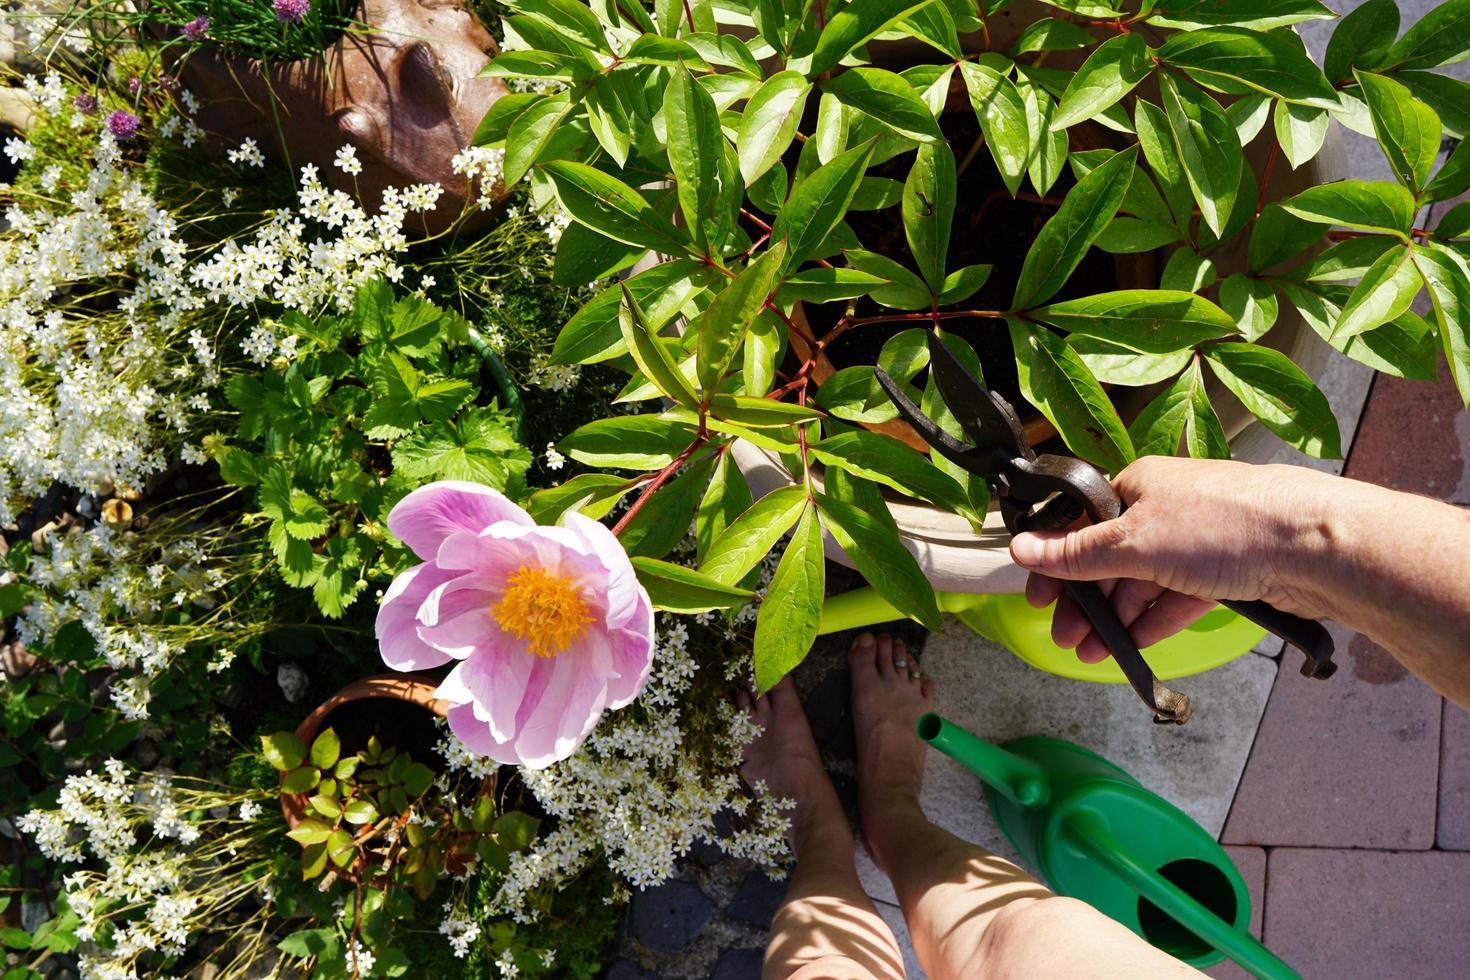 Woman watering the garden photo